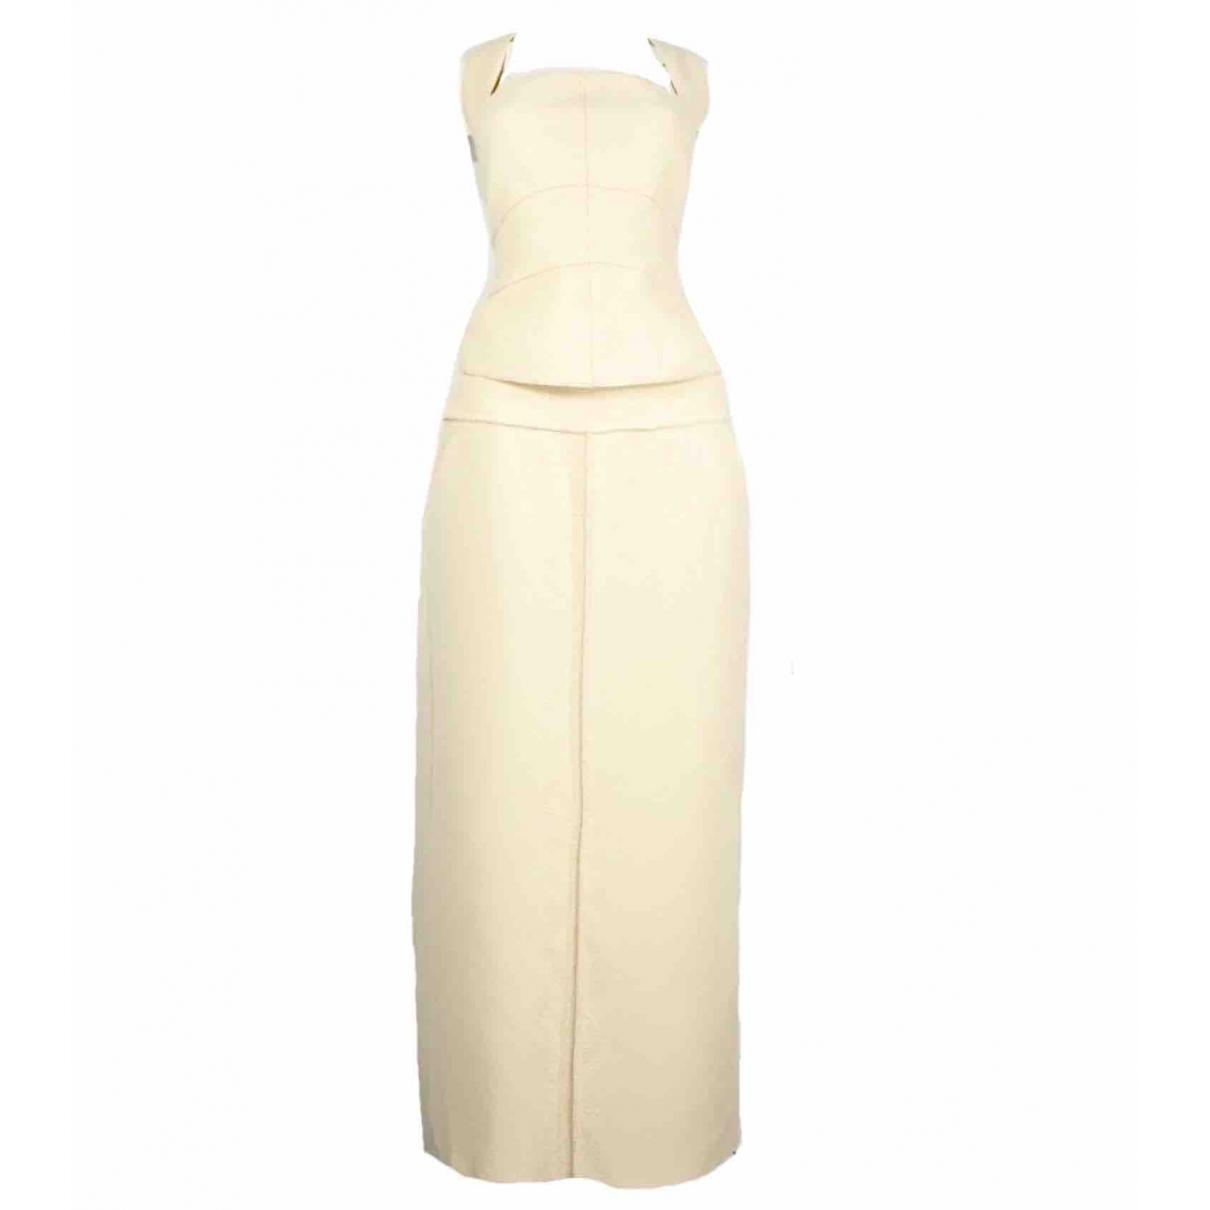 Chanel \N Ecru Wool skirt for Women 42 FR